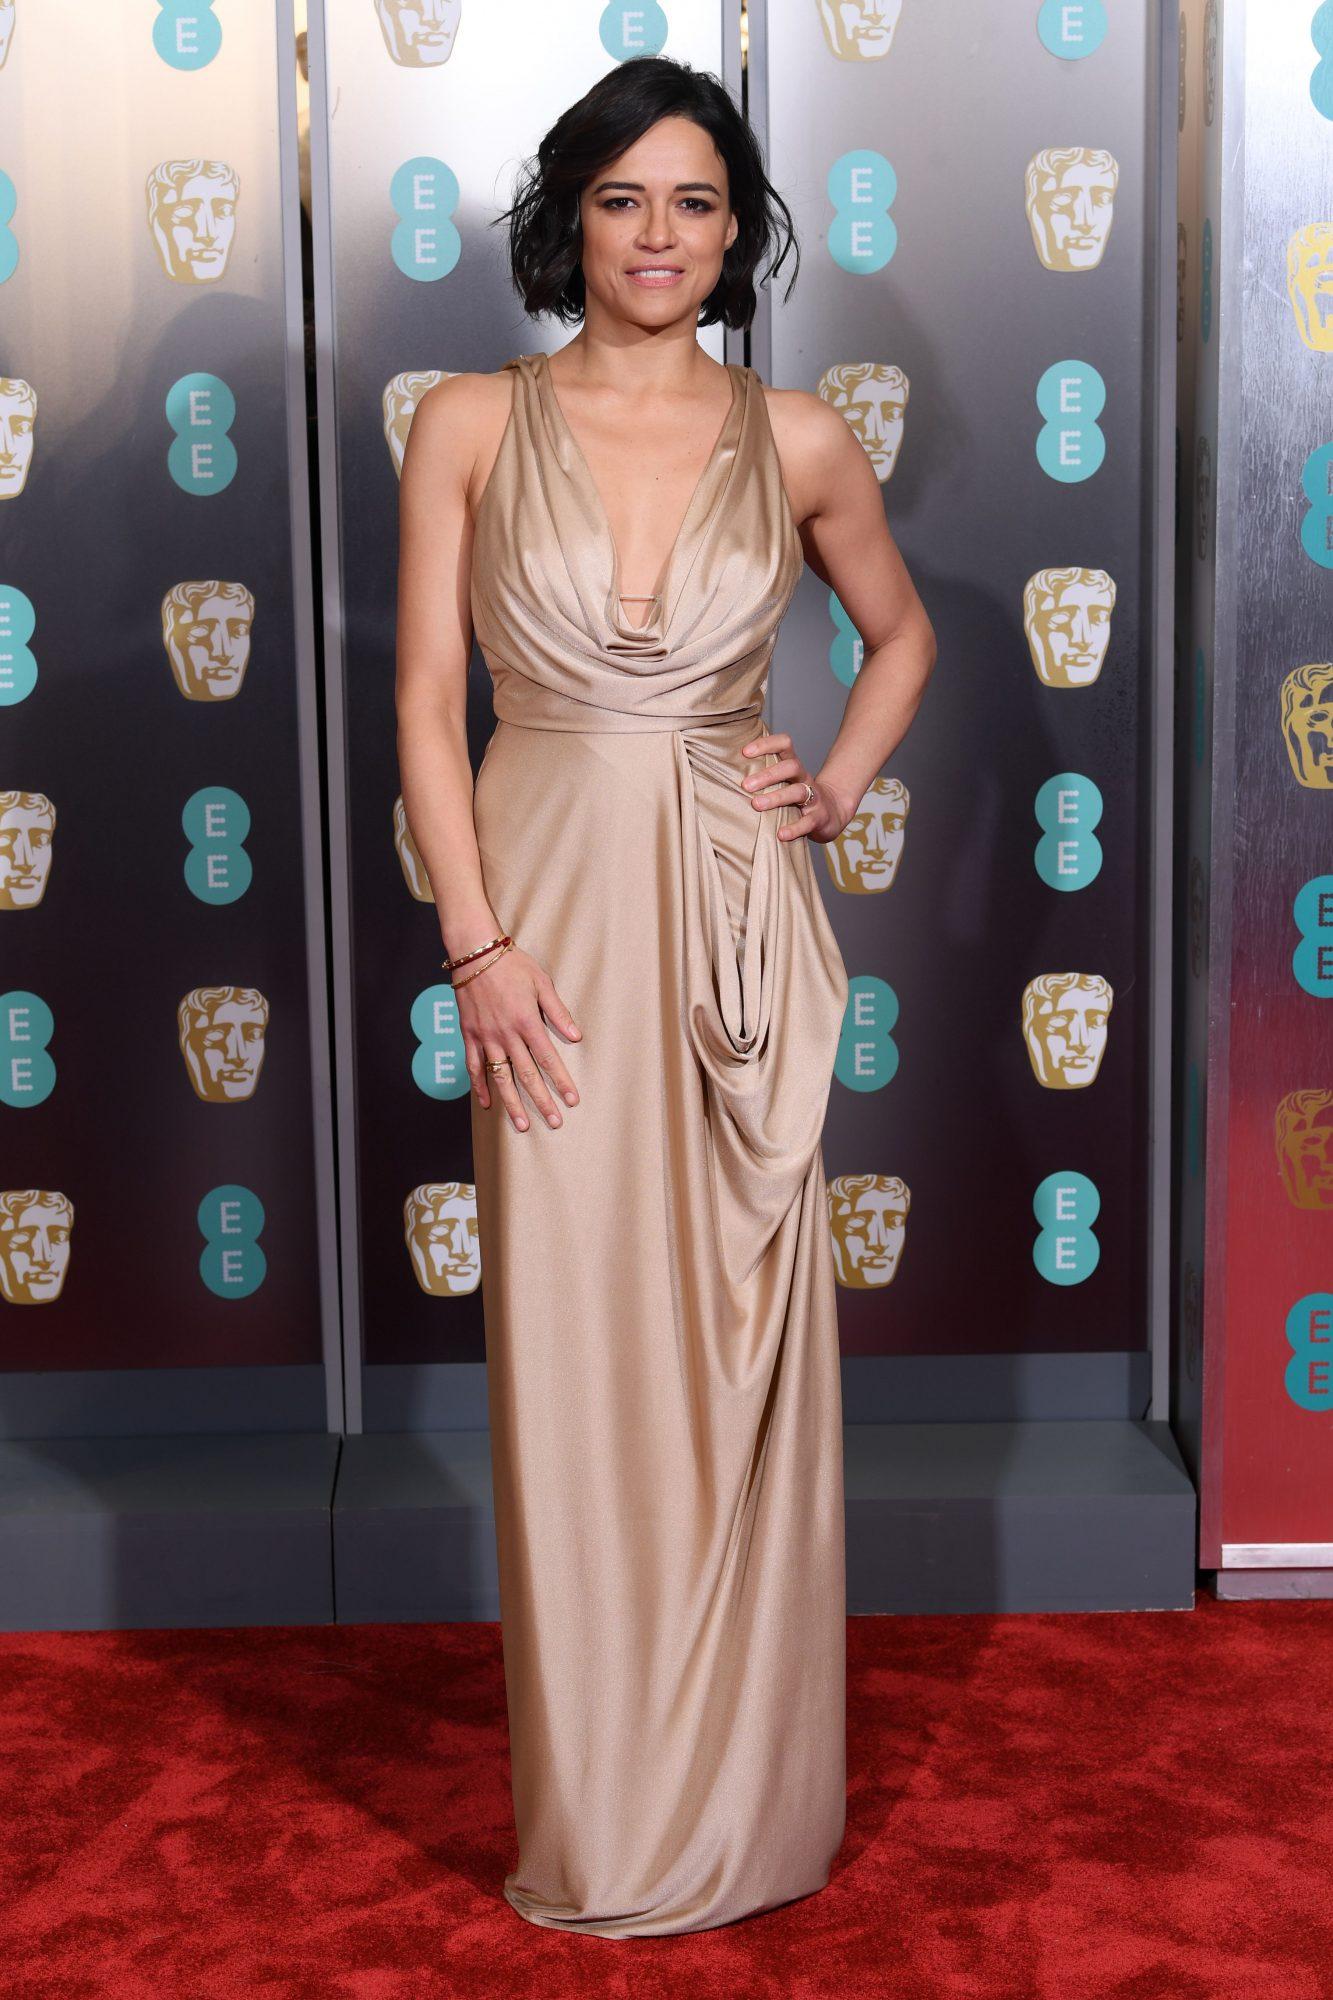 GALLERY: 2019 BAFTAs72nd British Academy Film Awards, Arrivals, Royal Albert Hall, London, UK - 10 Feb 2019